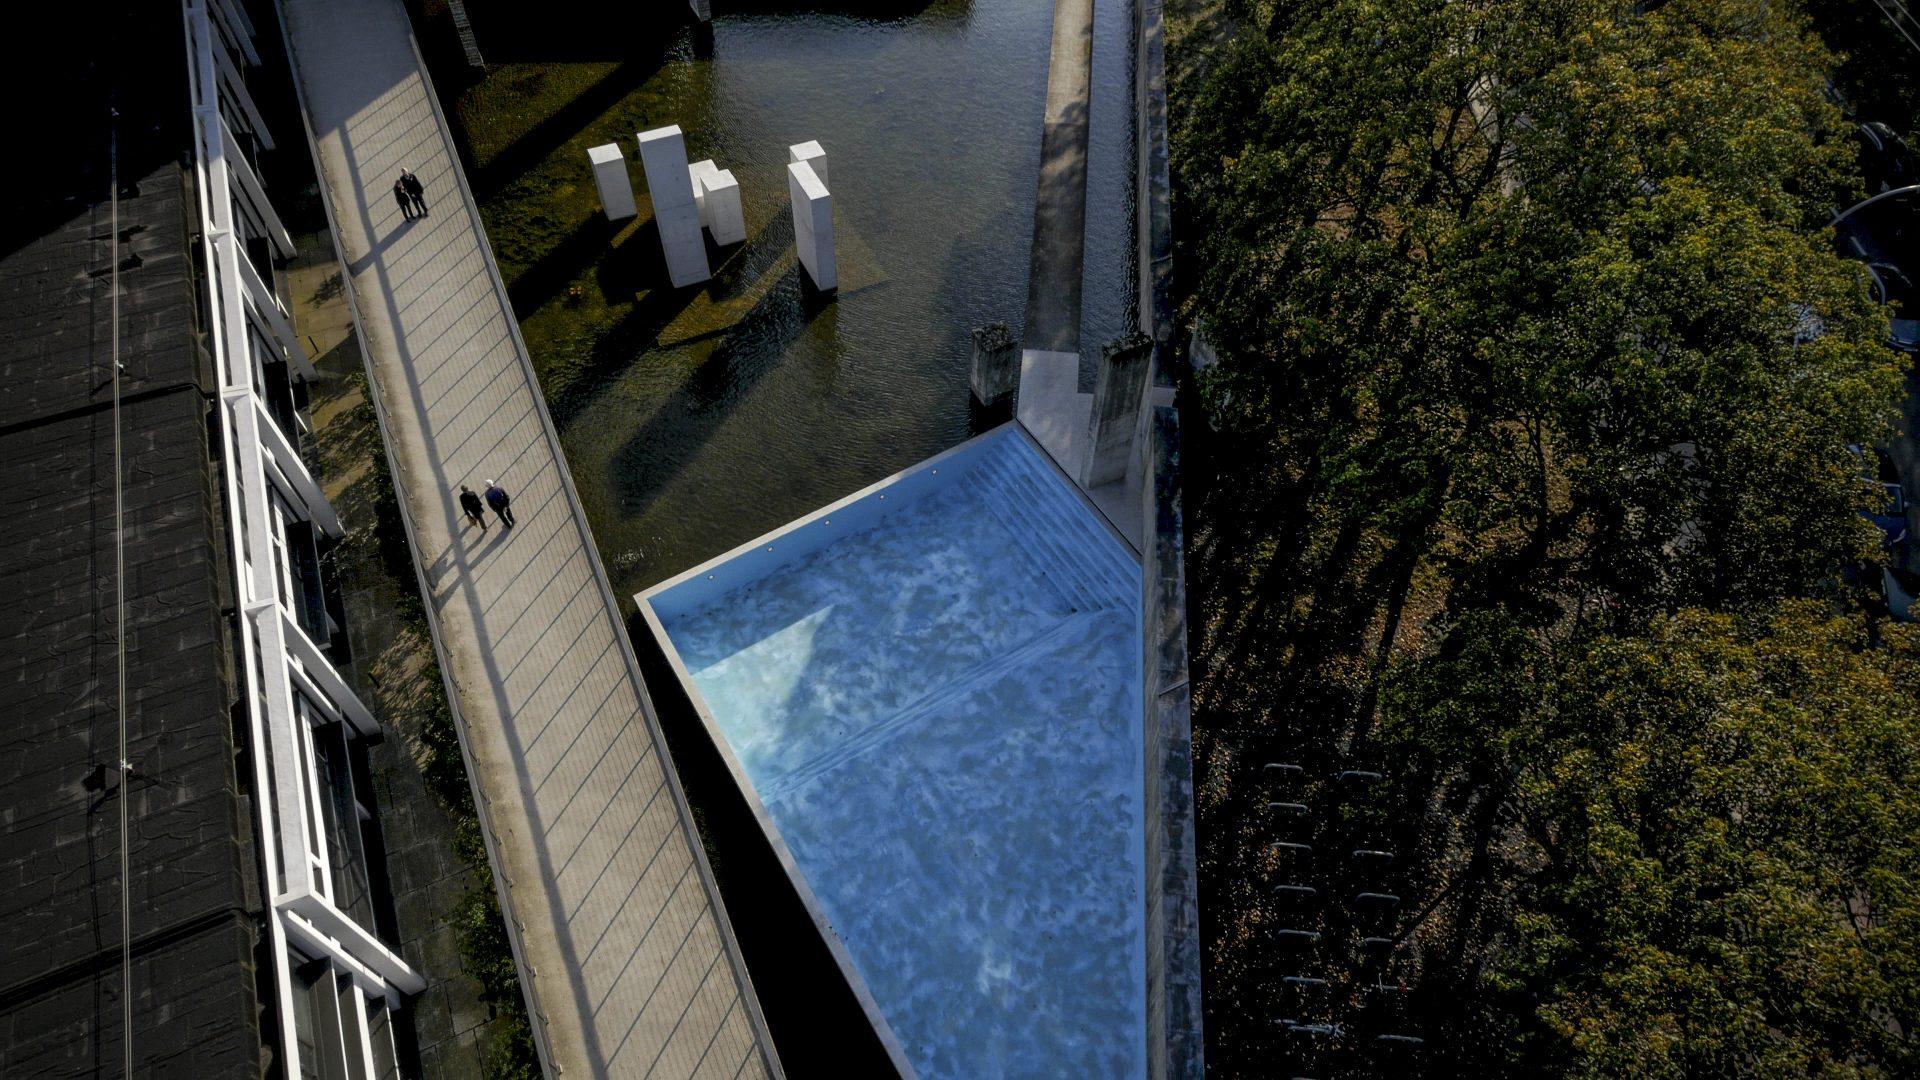 deSingel, Ballard Garden © Frans Vermost / New Impact